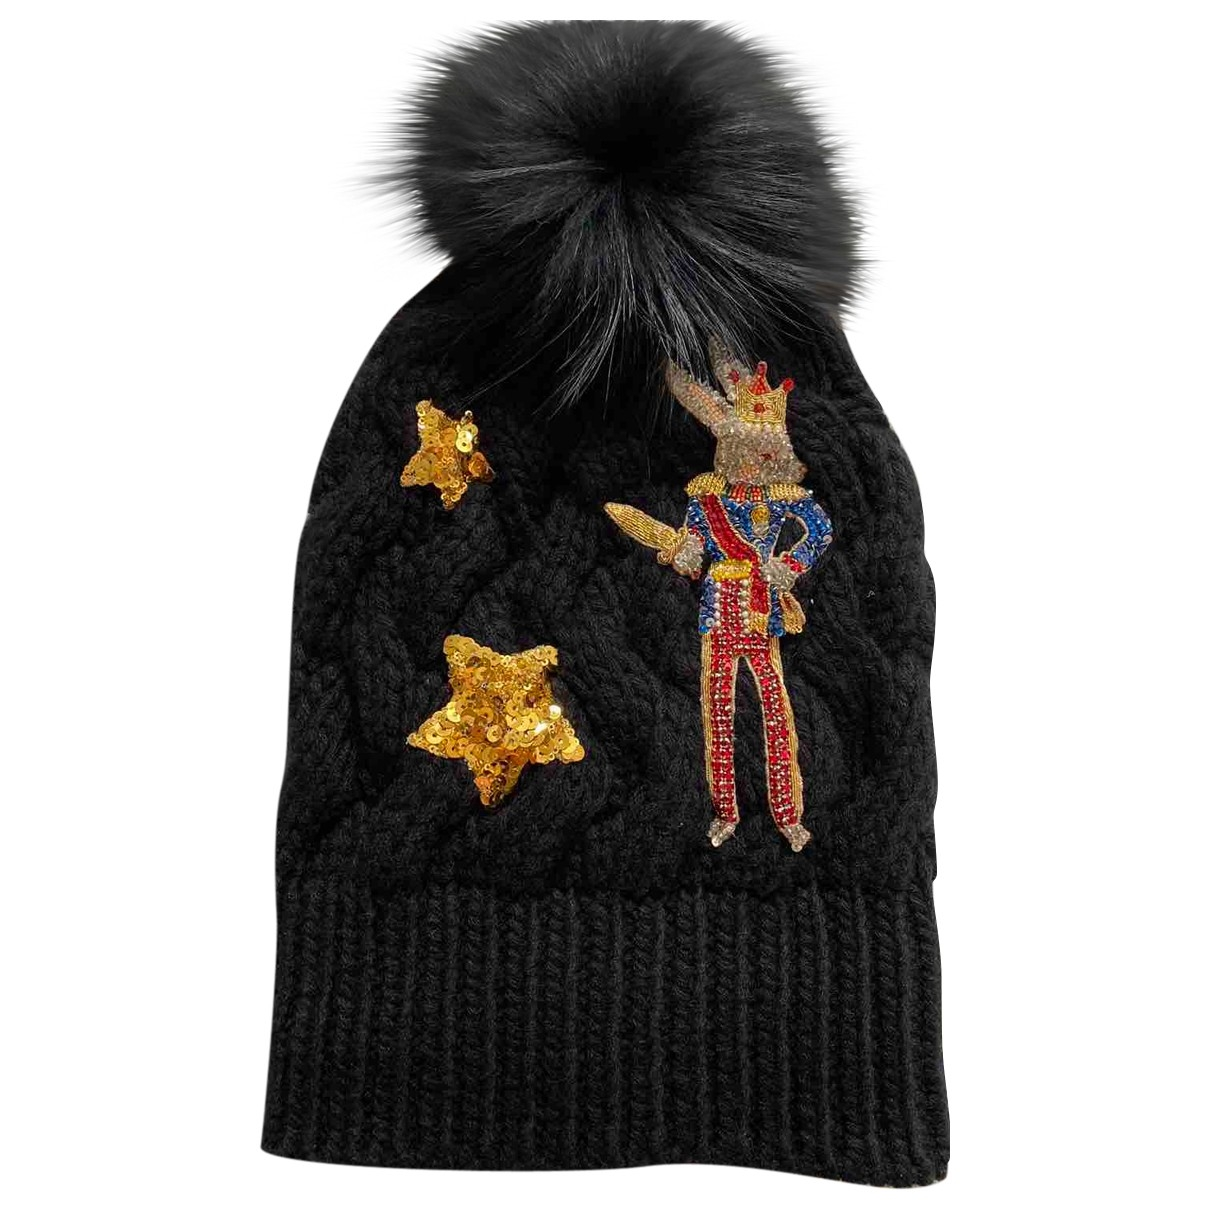 Dolce & Gabbana \N Black Cashmere hat for Women M International